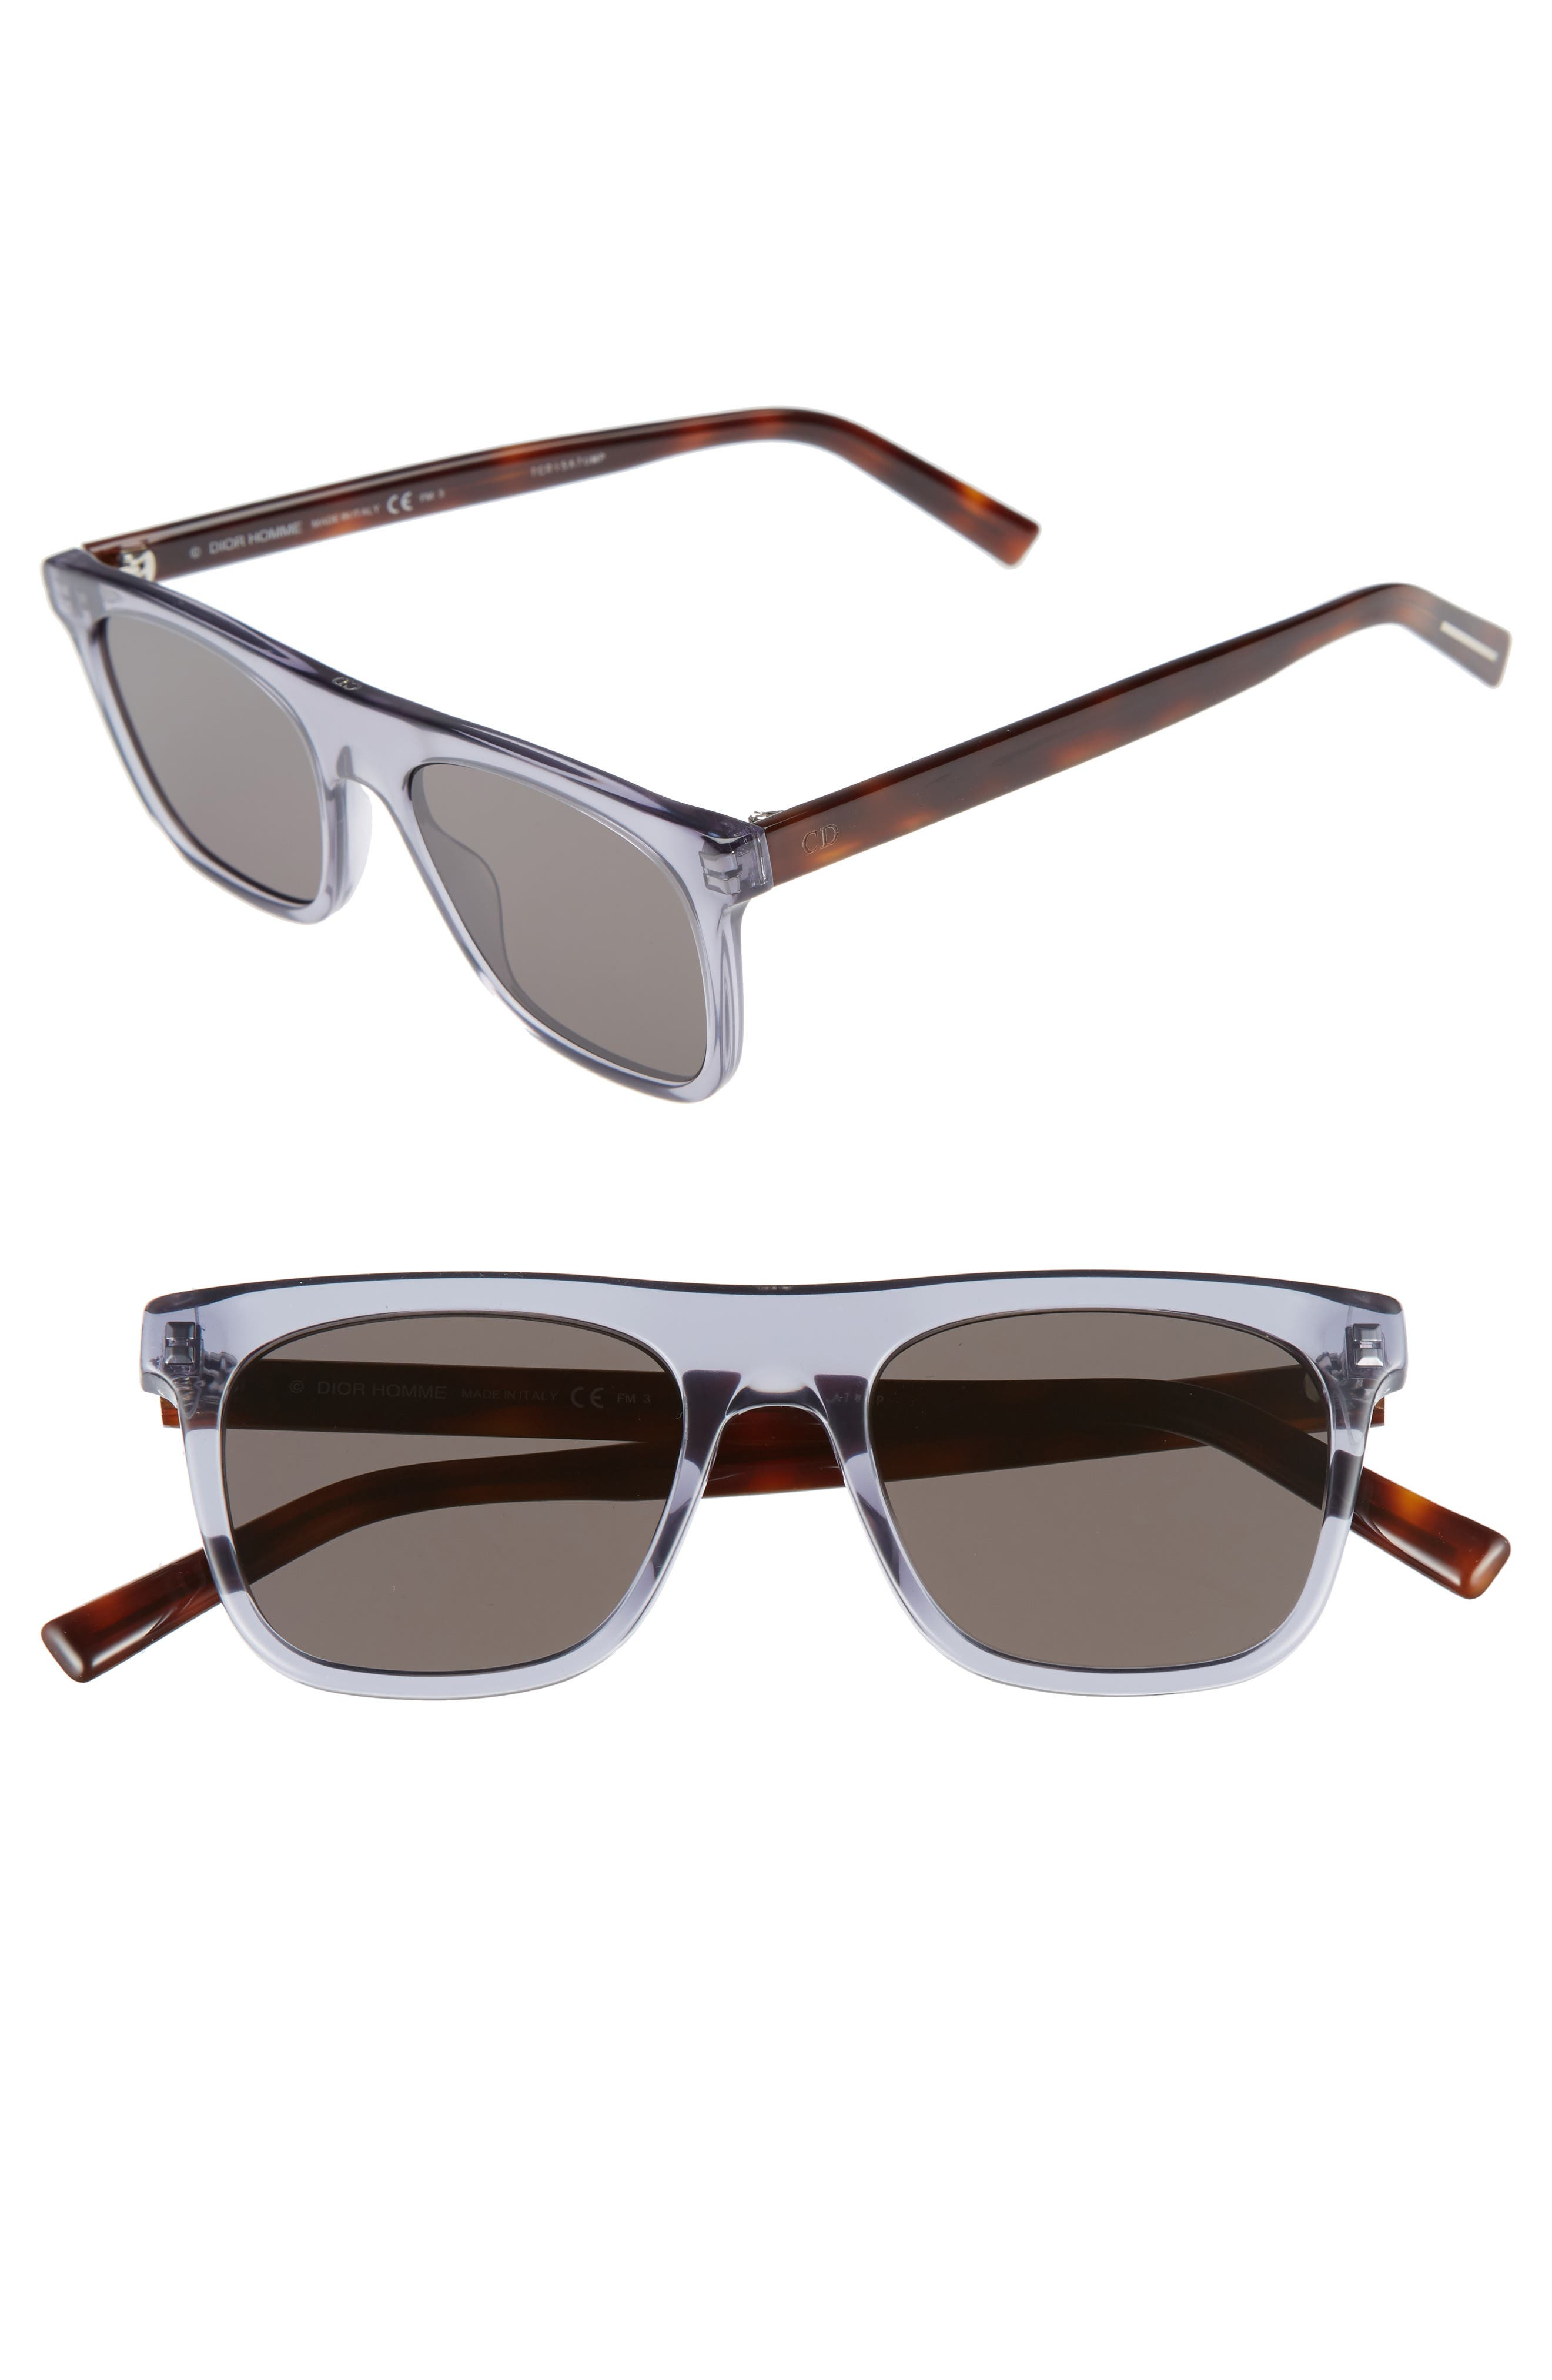 69bf917dfcbc Men s Dior Sunglasses   Eyeglasses